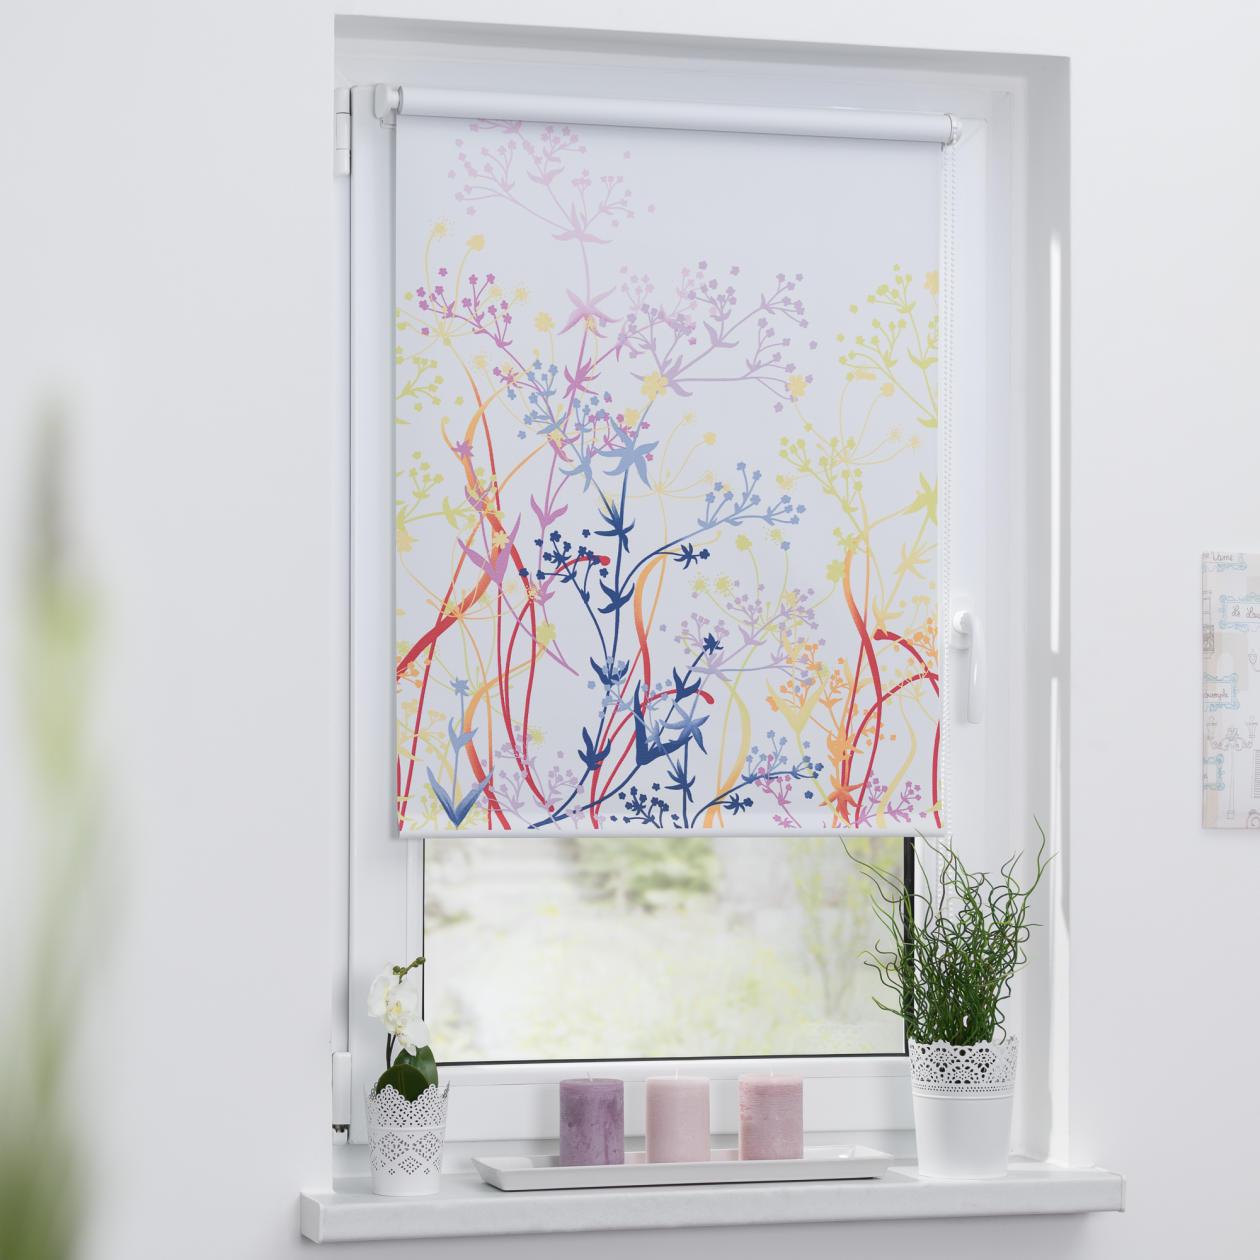 rollo klemmfix ohne bohren verdunkelung flower power lichblick shop. Black Bedroom Furniture Sets. Home Design Ideas